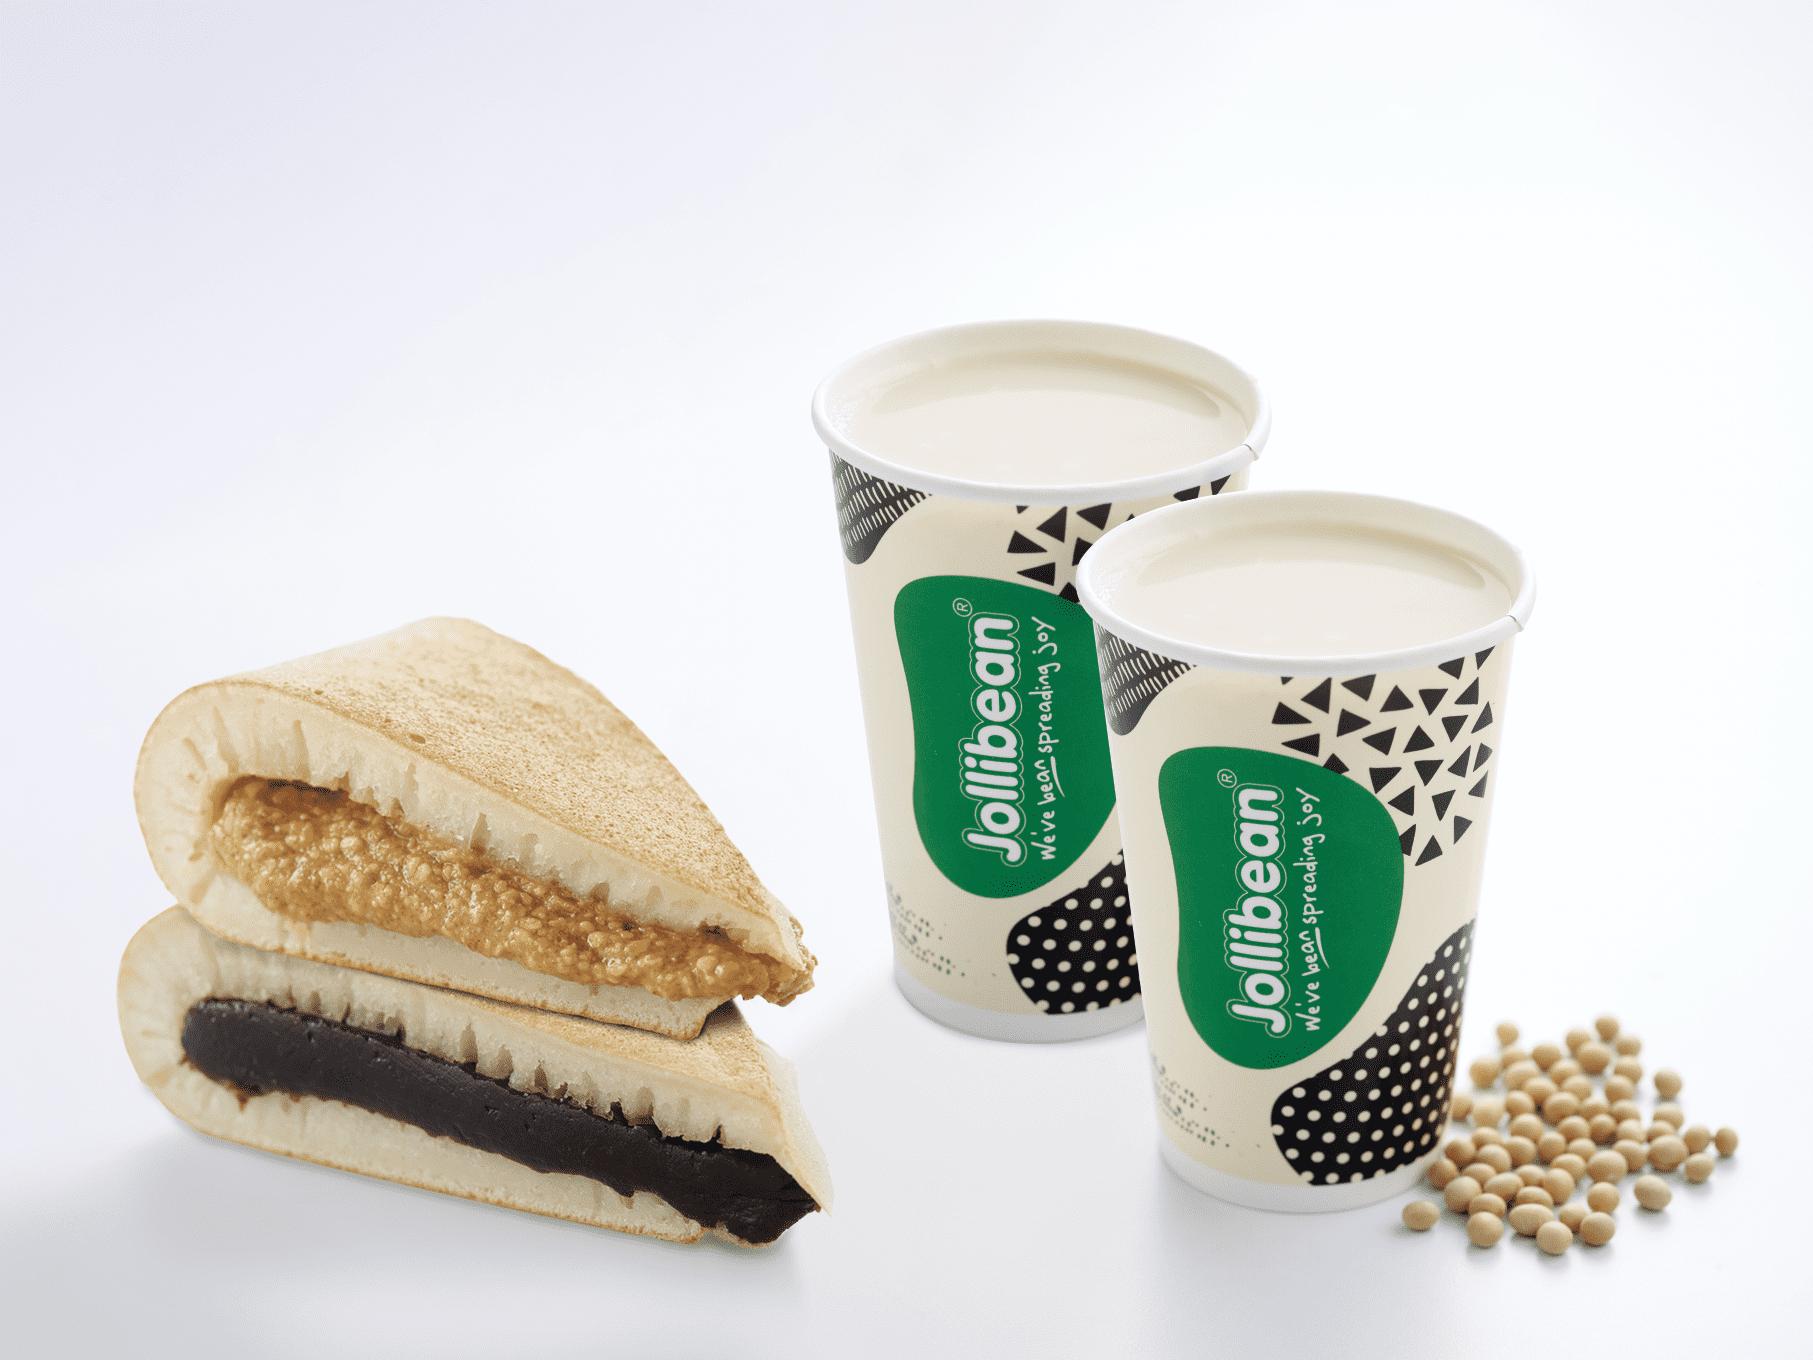 2 x Mee Chiang Kueh + Bottled Soy Milk / Fresh Soy Milk Set [Exclusive Deal]